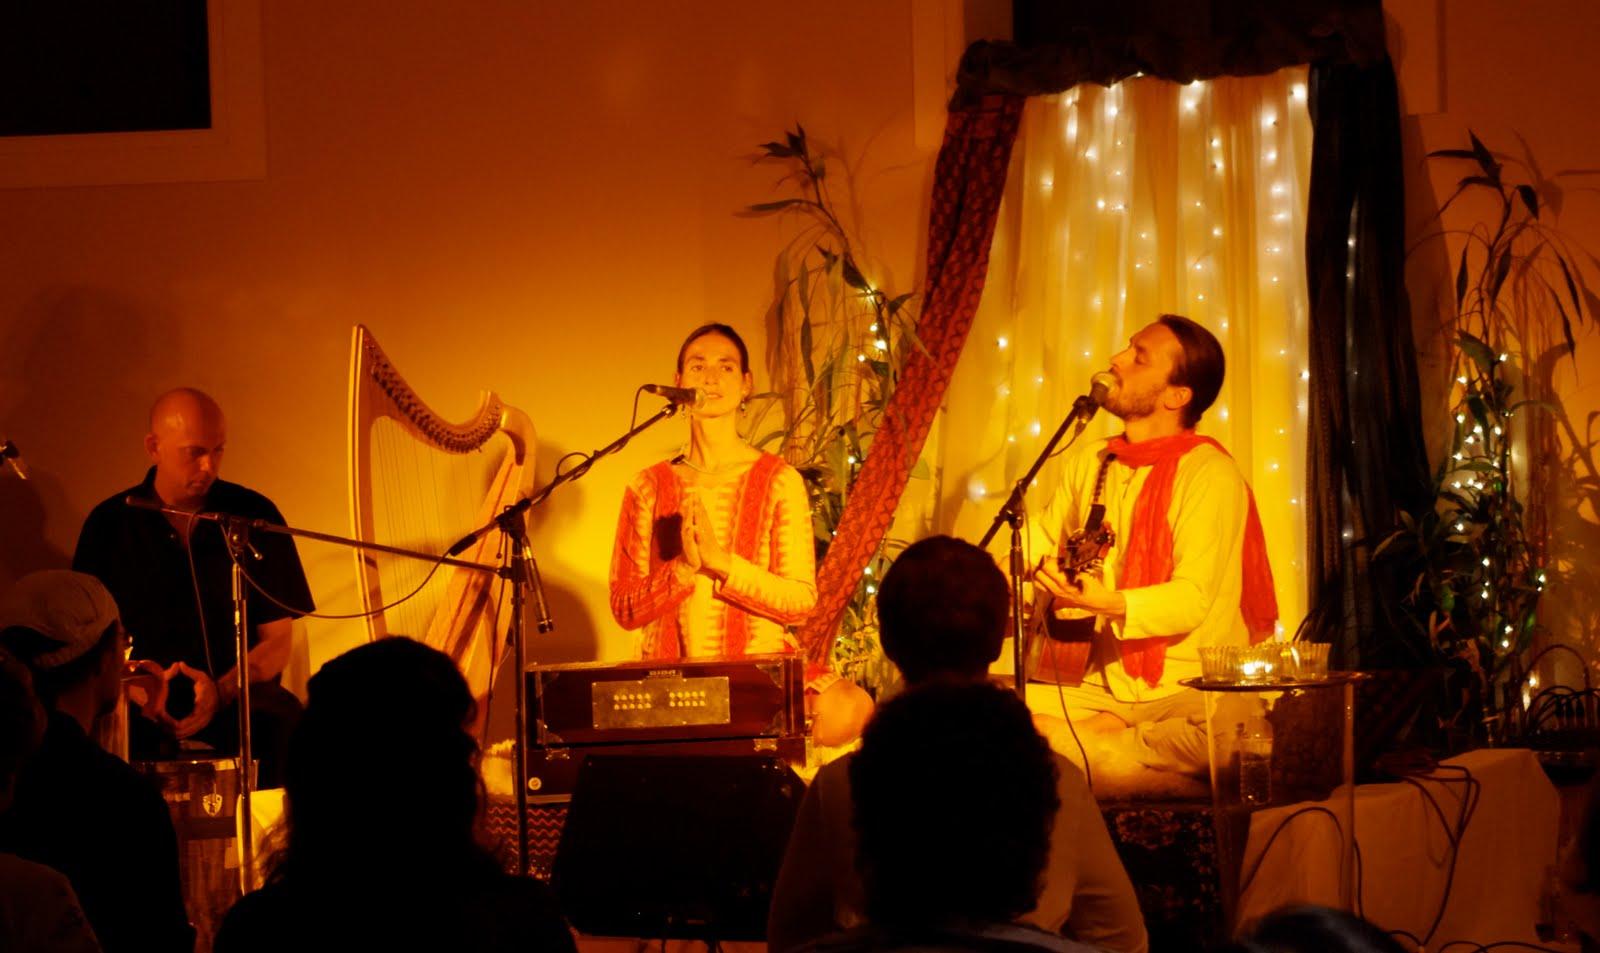 Candlelight Tratakum Meditation with Mirabai Ceiba